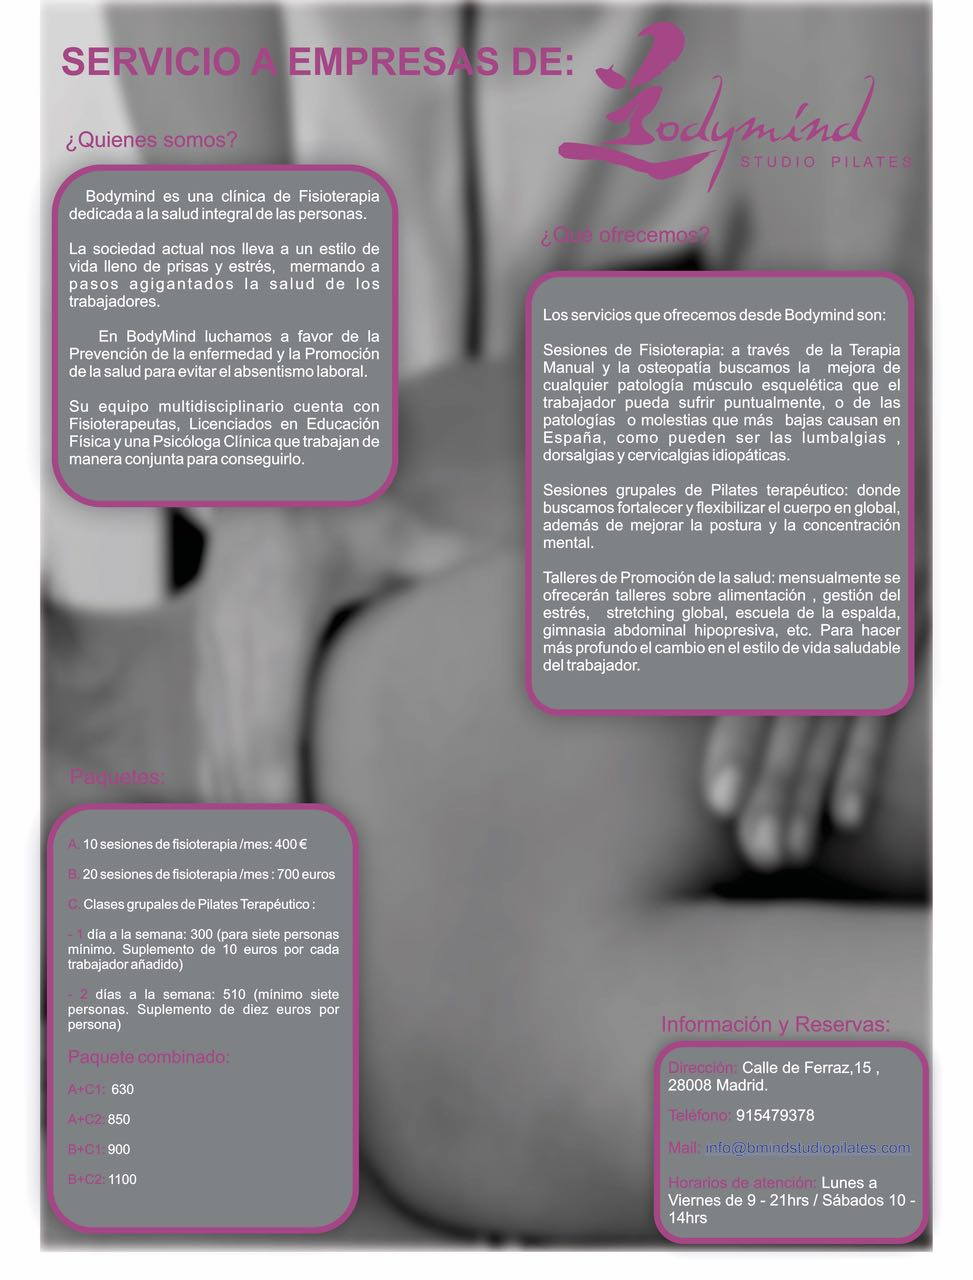 Servicio a empresas Bodymind Studio Pilates